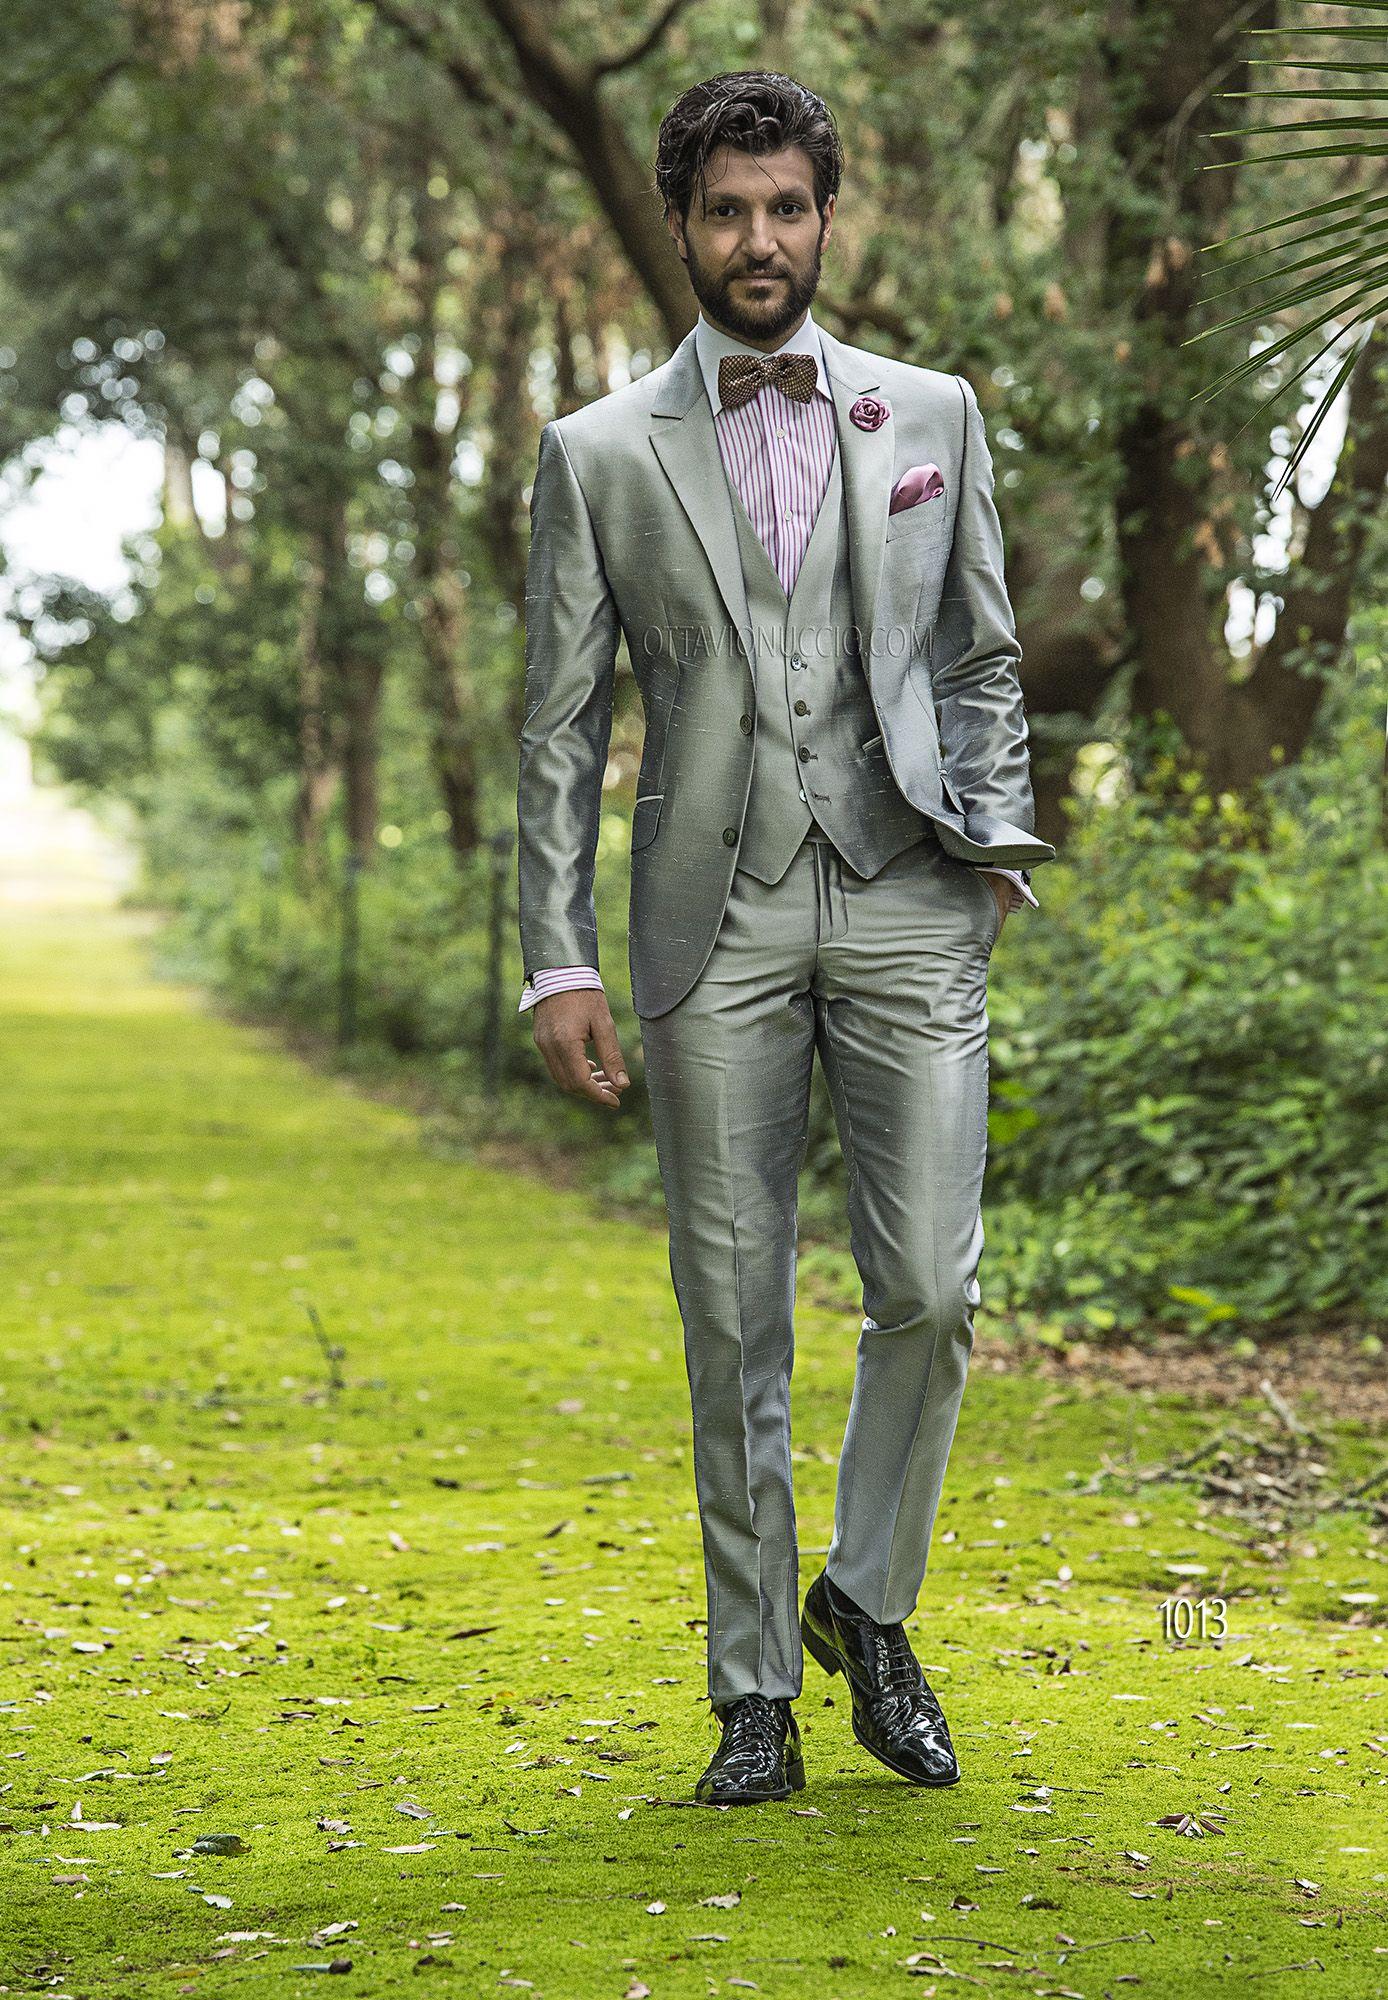 Hipster Matrimonio Uomo : Abito da cerimonia uomo in shantung grigio perla moda uomo